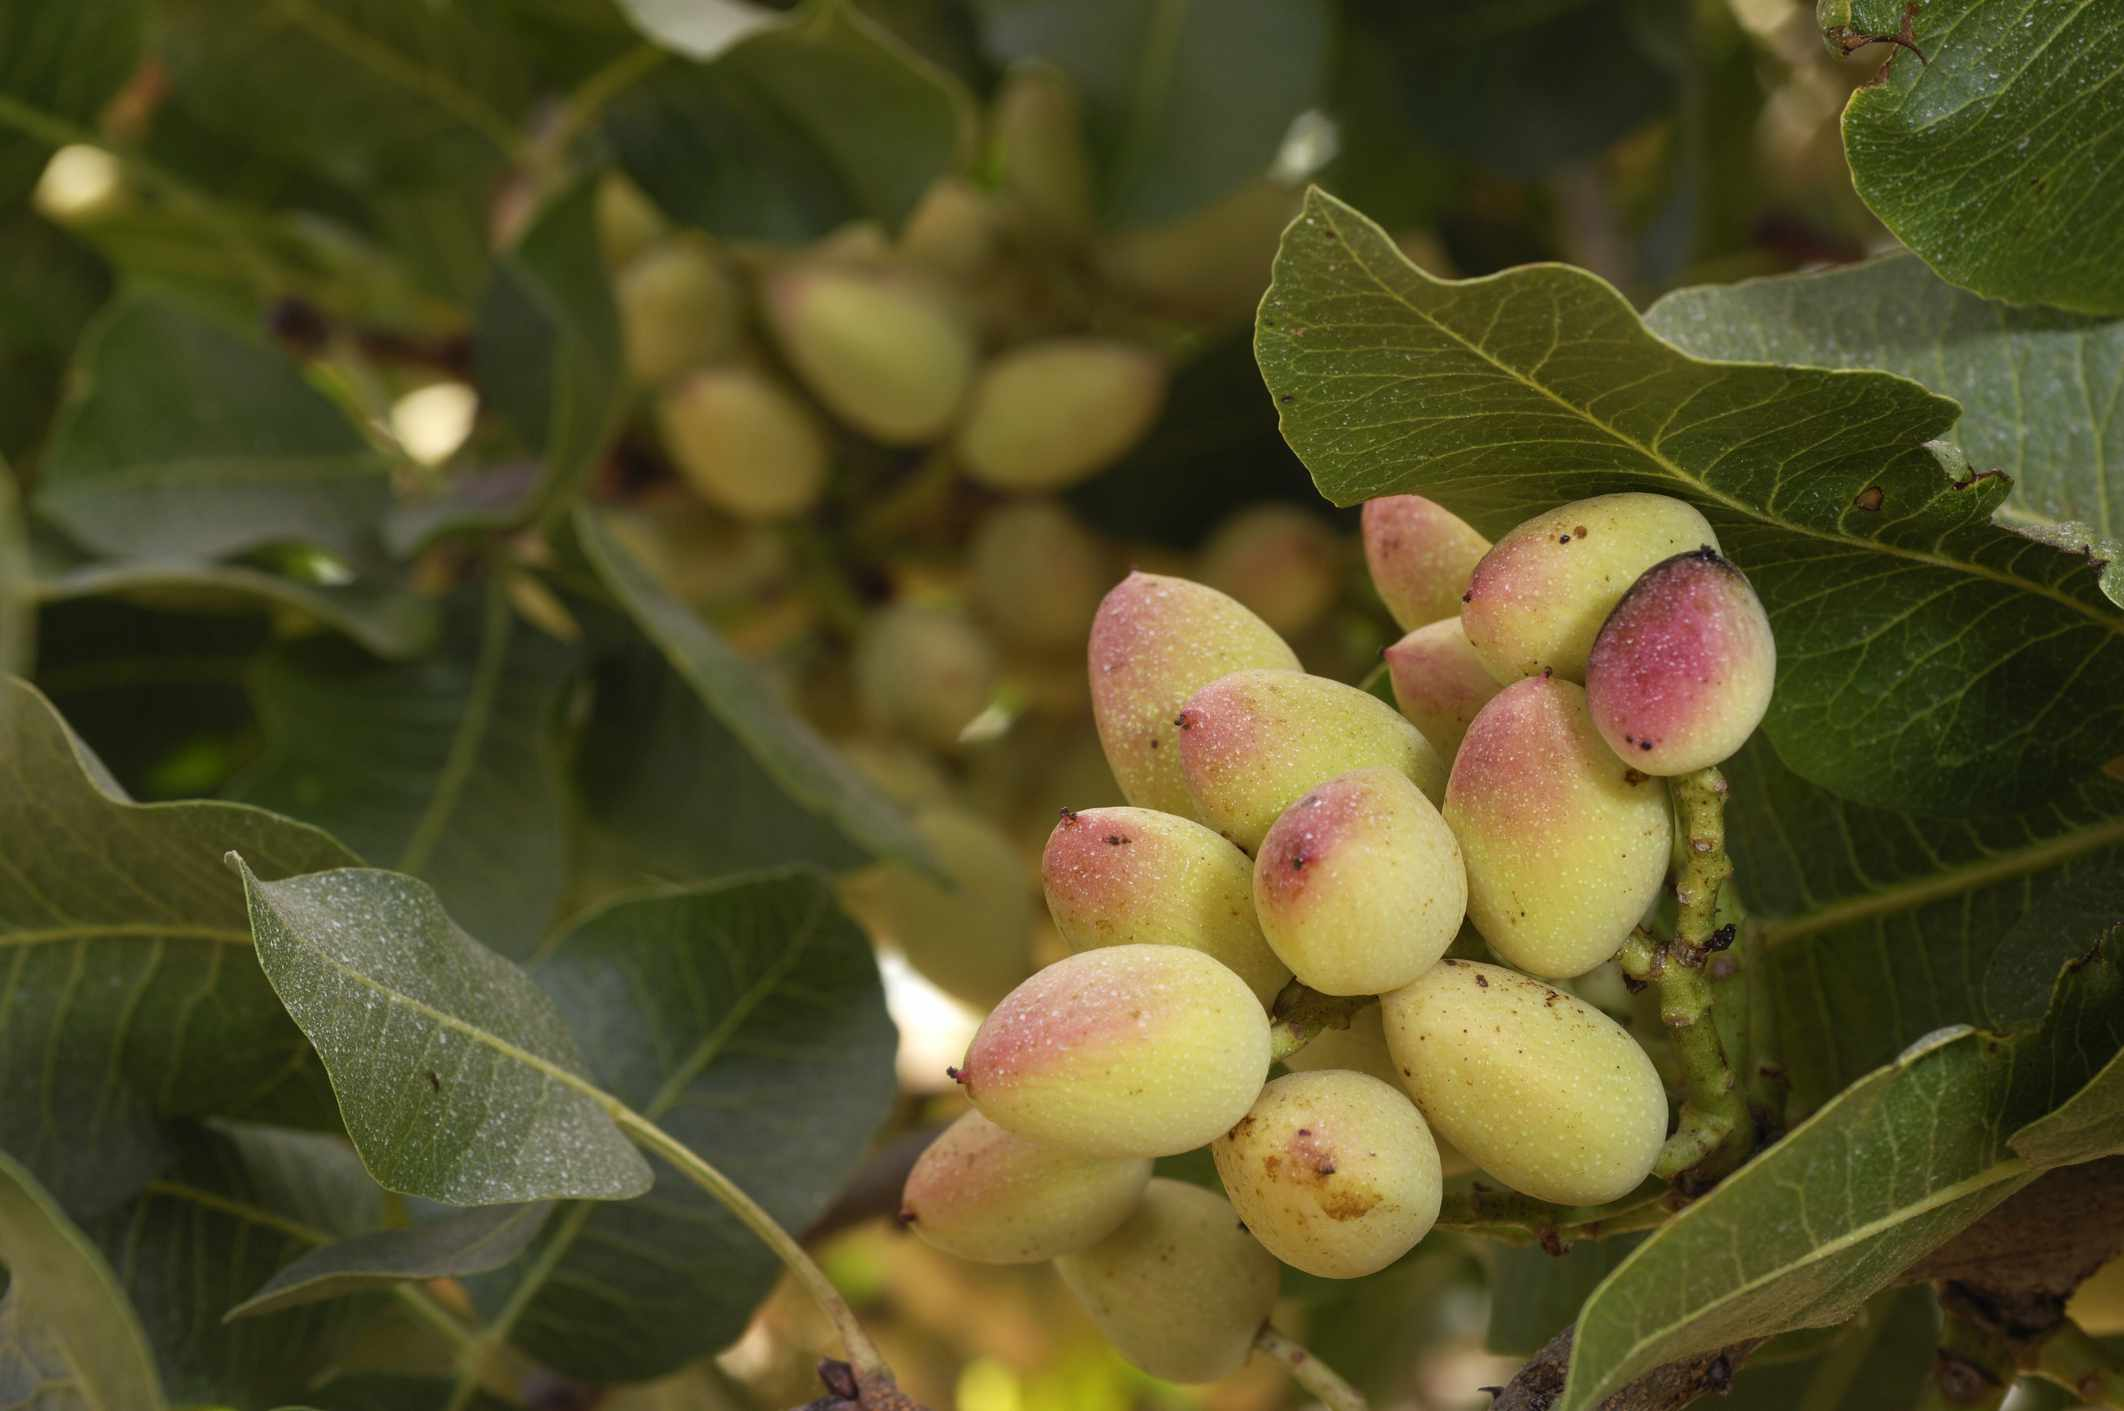 Ripening pistachio nuts on tree